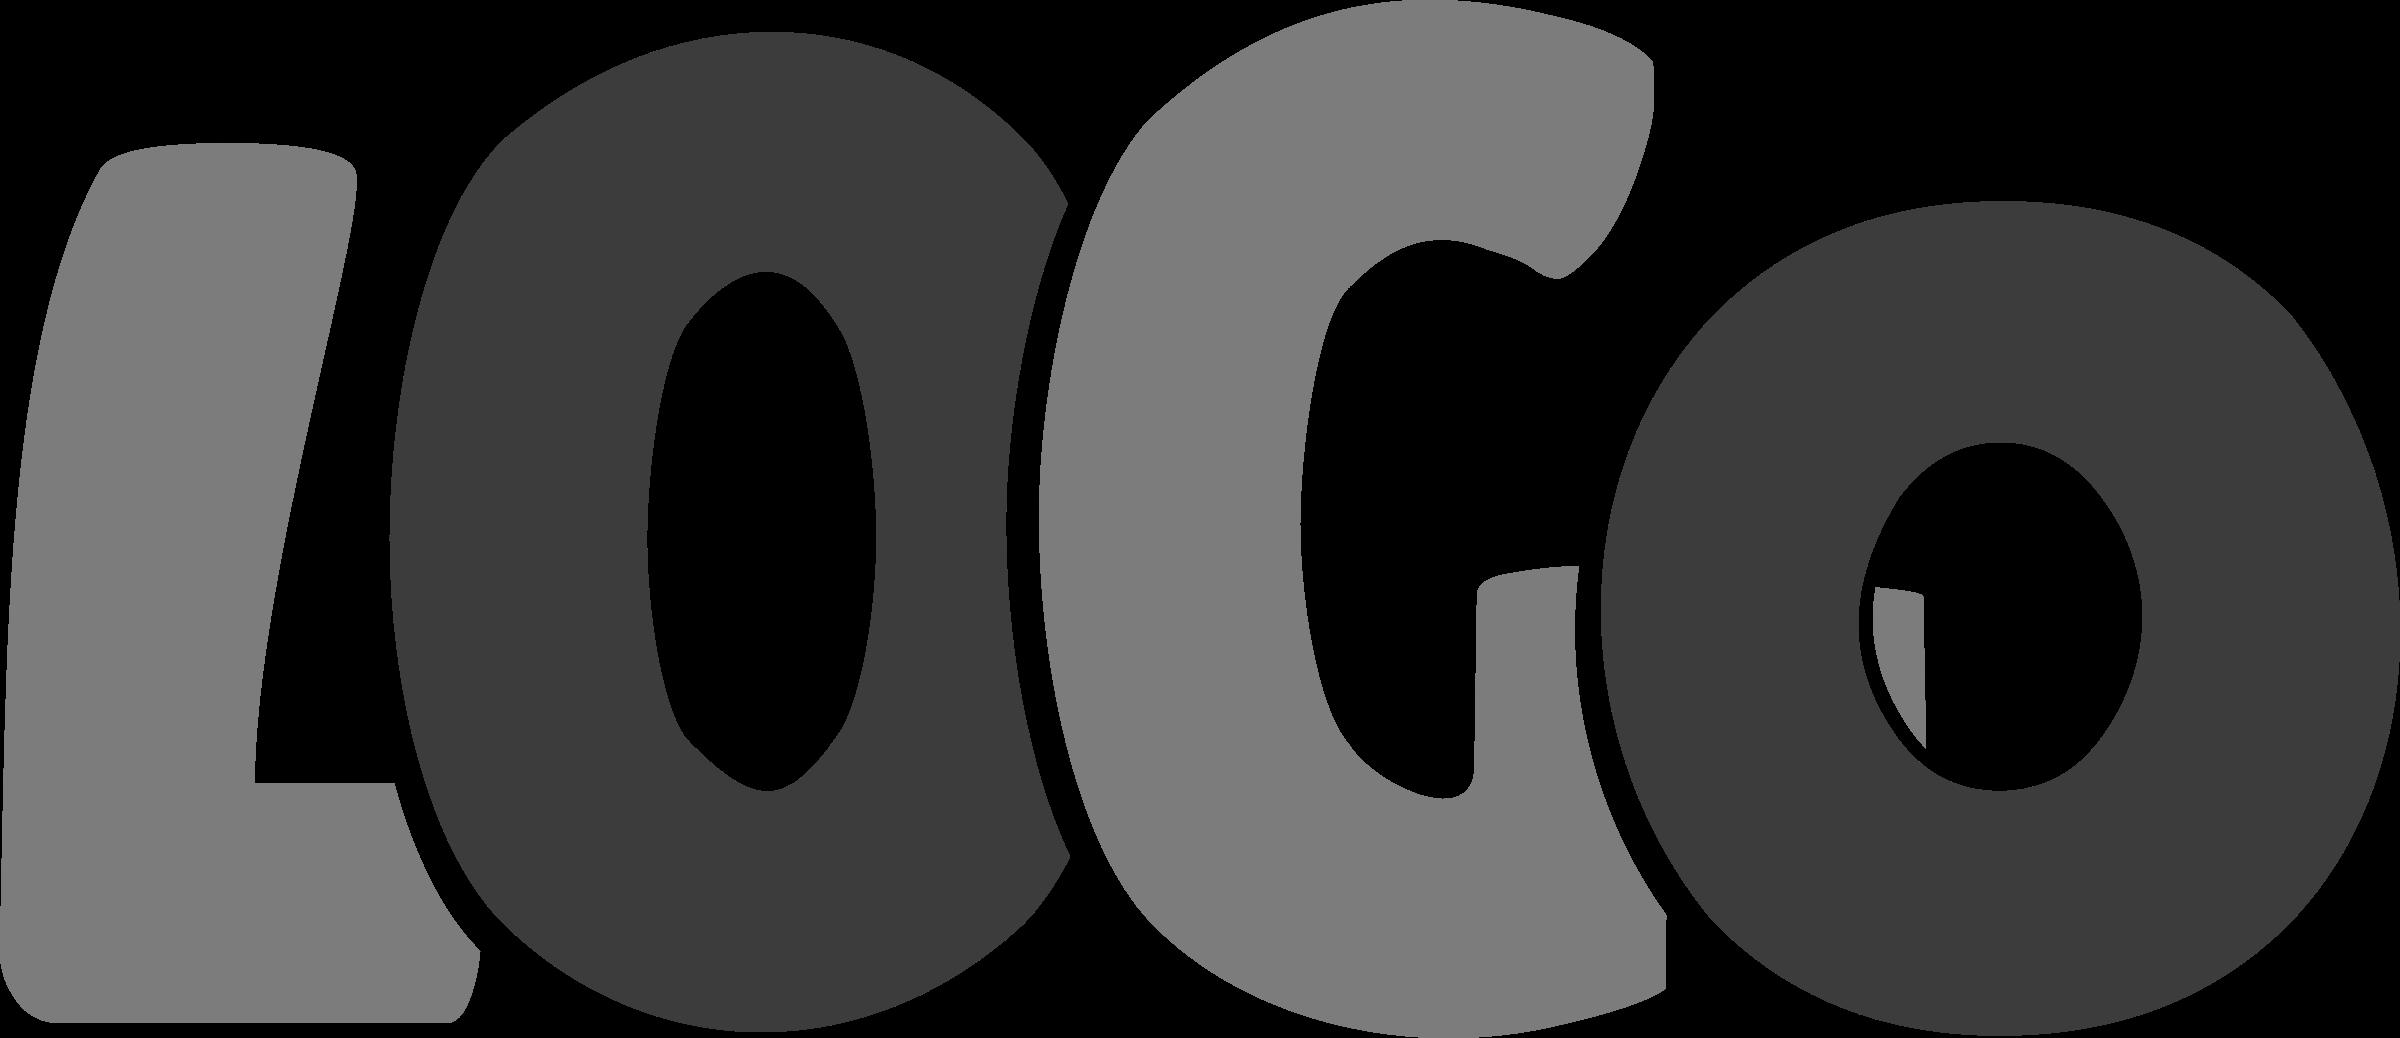 Clipart logo logo grayscale for Logo clipart